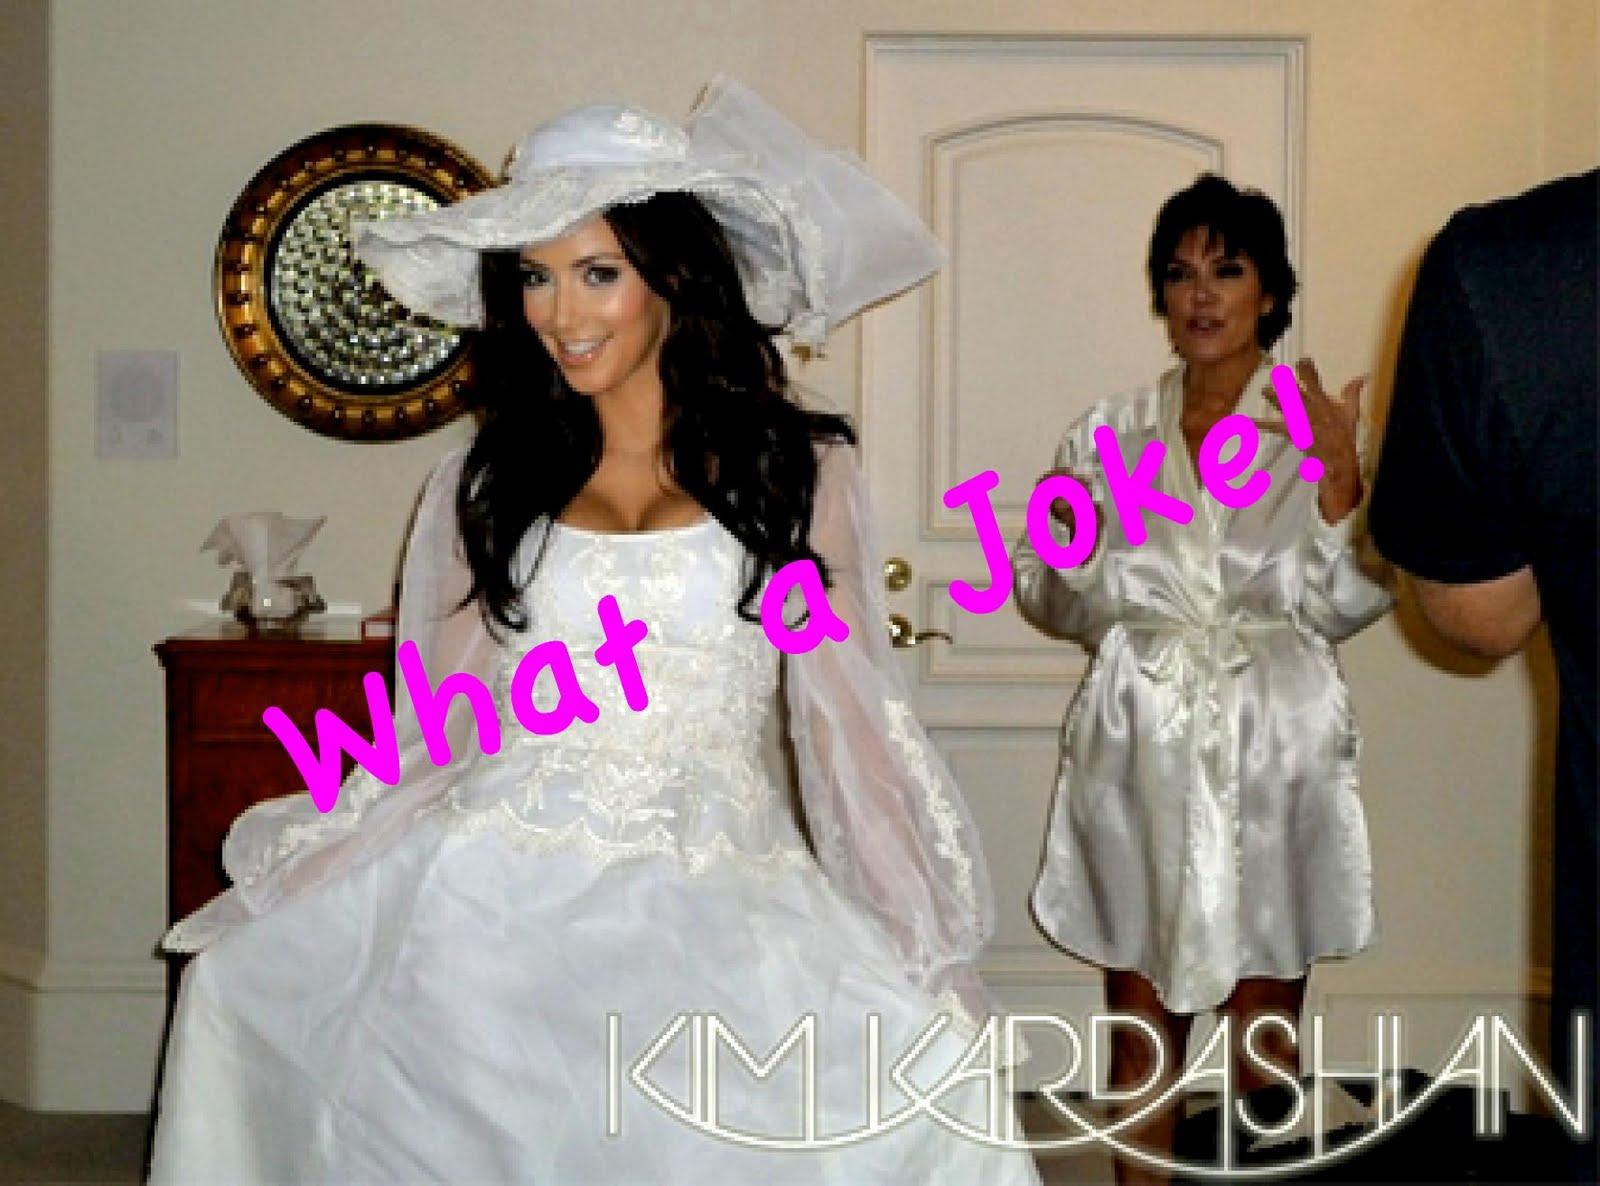 http://2.bp.blogspot.com/-NFfkyASfGu8/Tq7oXOzFkaI/AAAAAAAAISg/g5Tsp1ykYdM/s1600/Kardashian%2BJoke%2BWedding.jpg